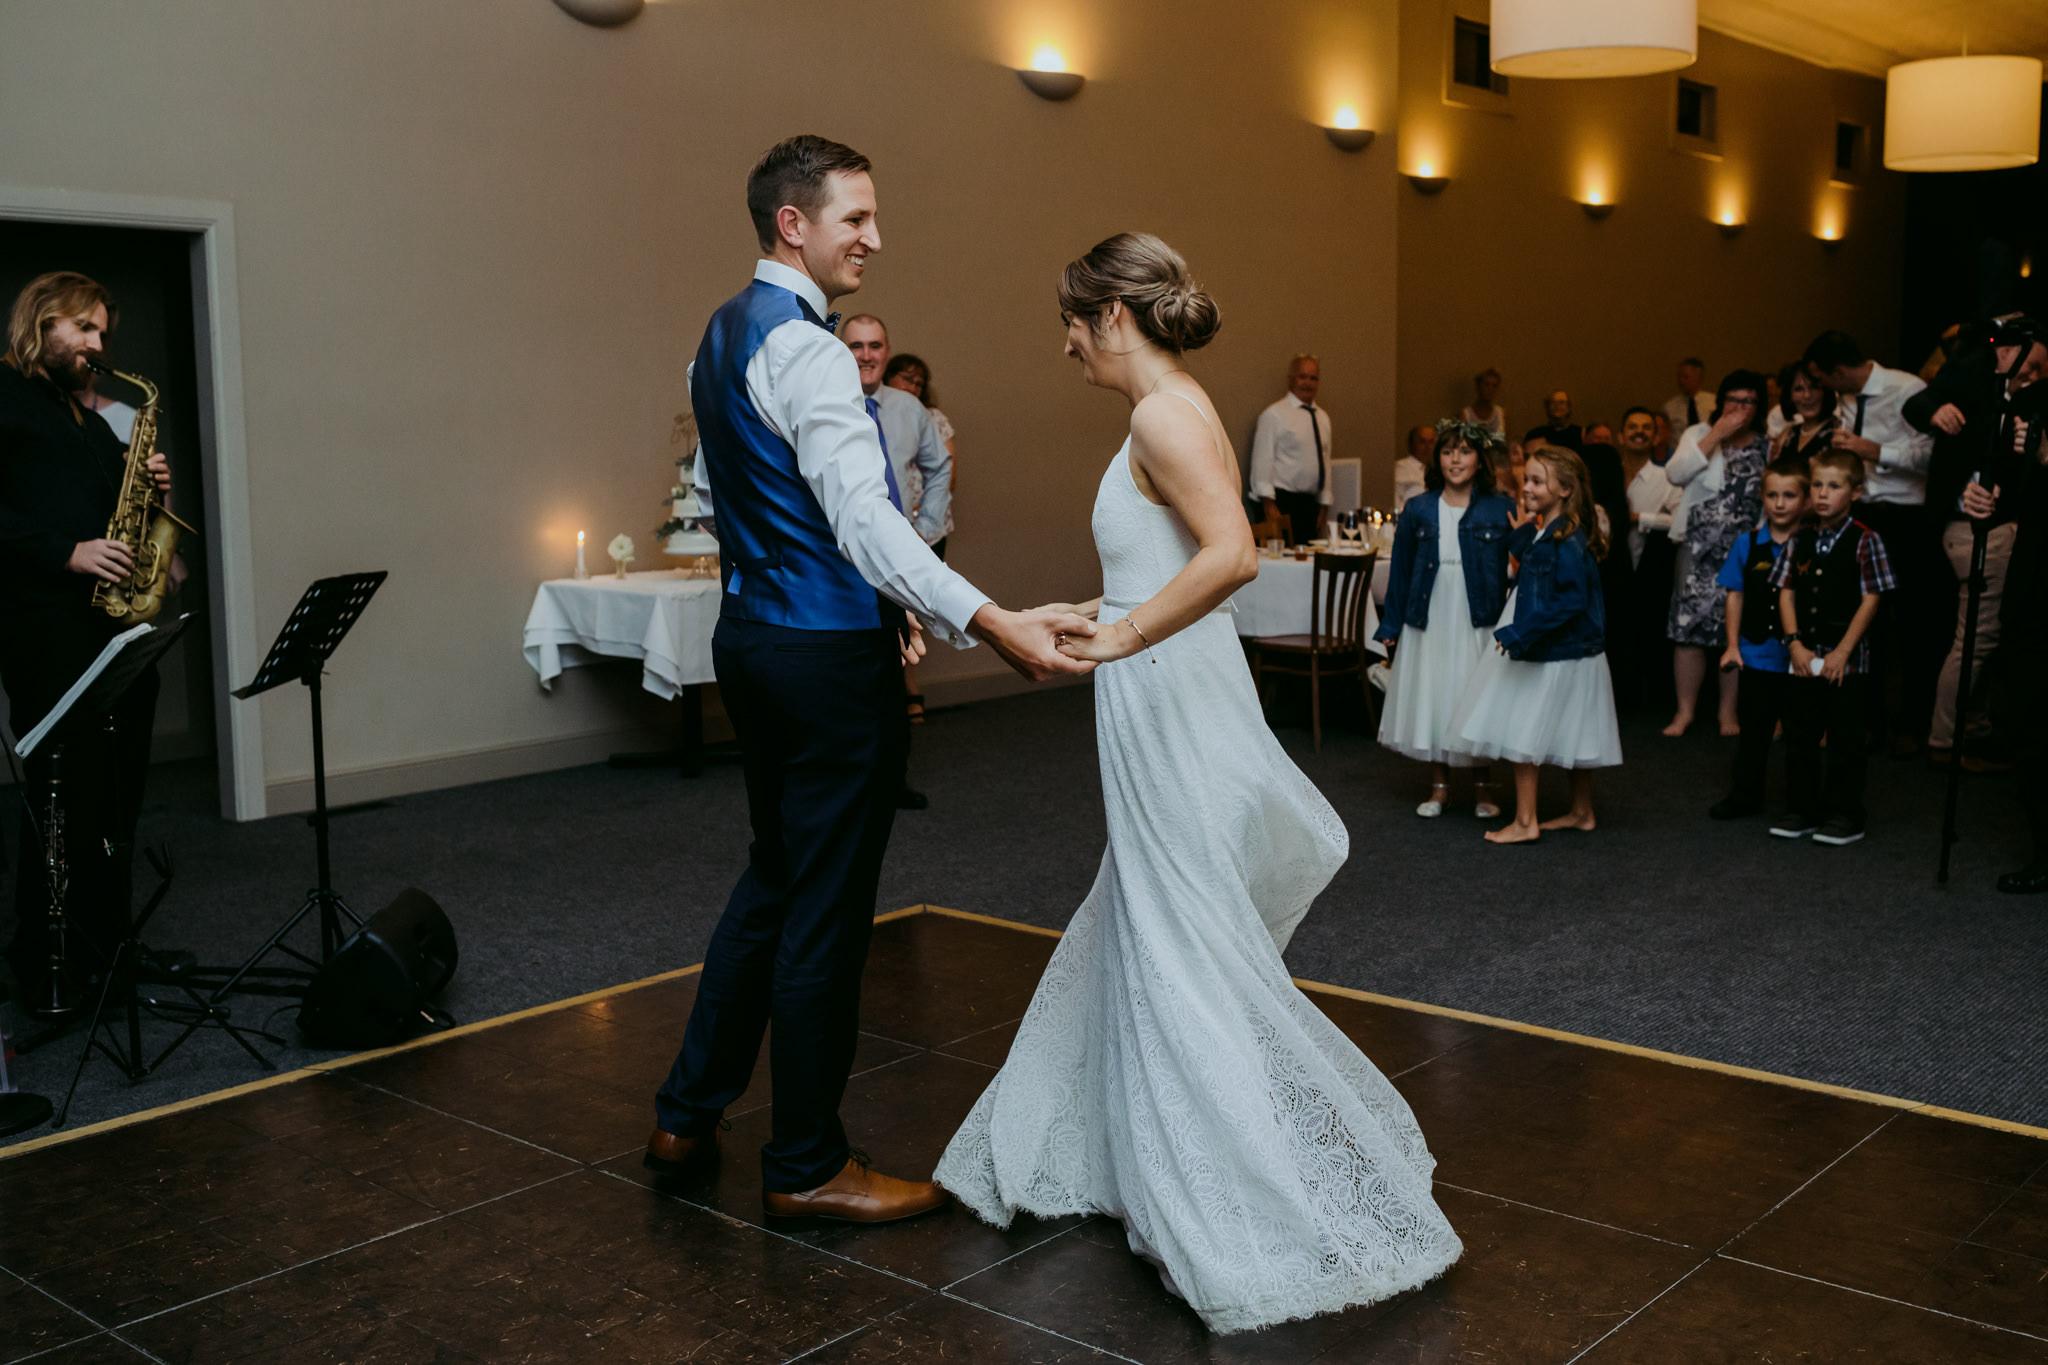 Erin Latimore Mudgee Canberra Wedding Photographer ROSEBANK GUESTHOUSE OLD THEATRE TONIC MILLTHORPE_791.JPG